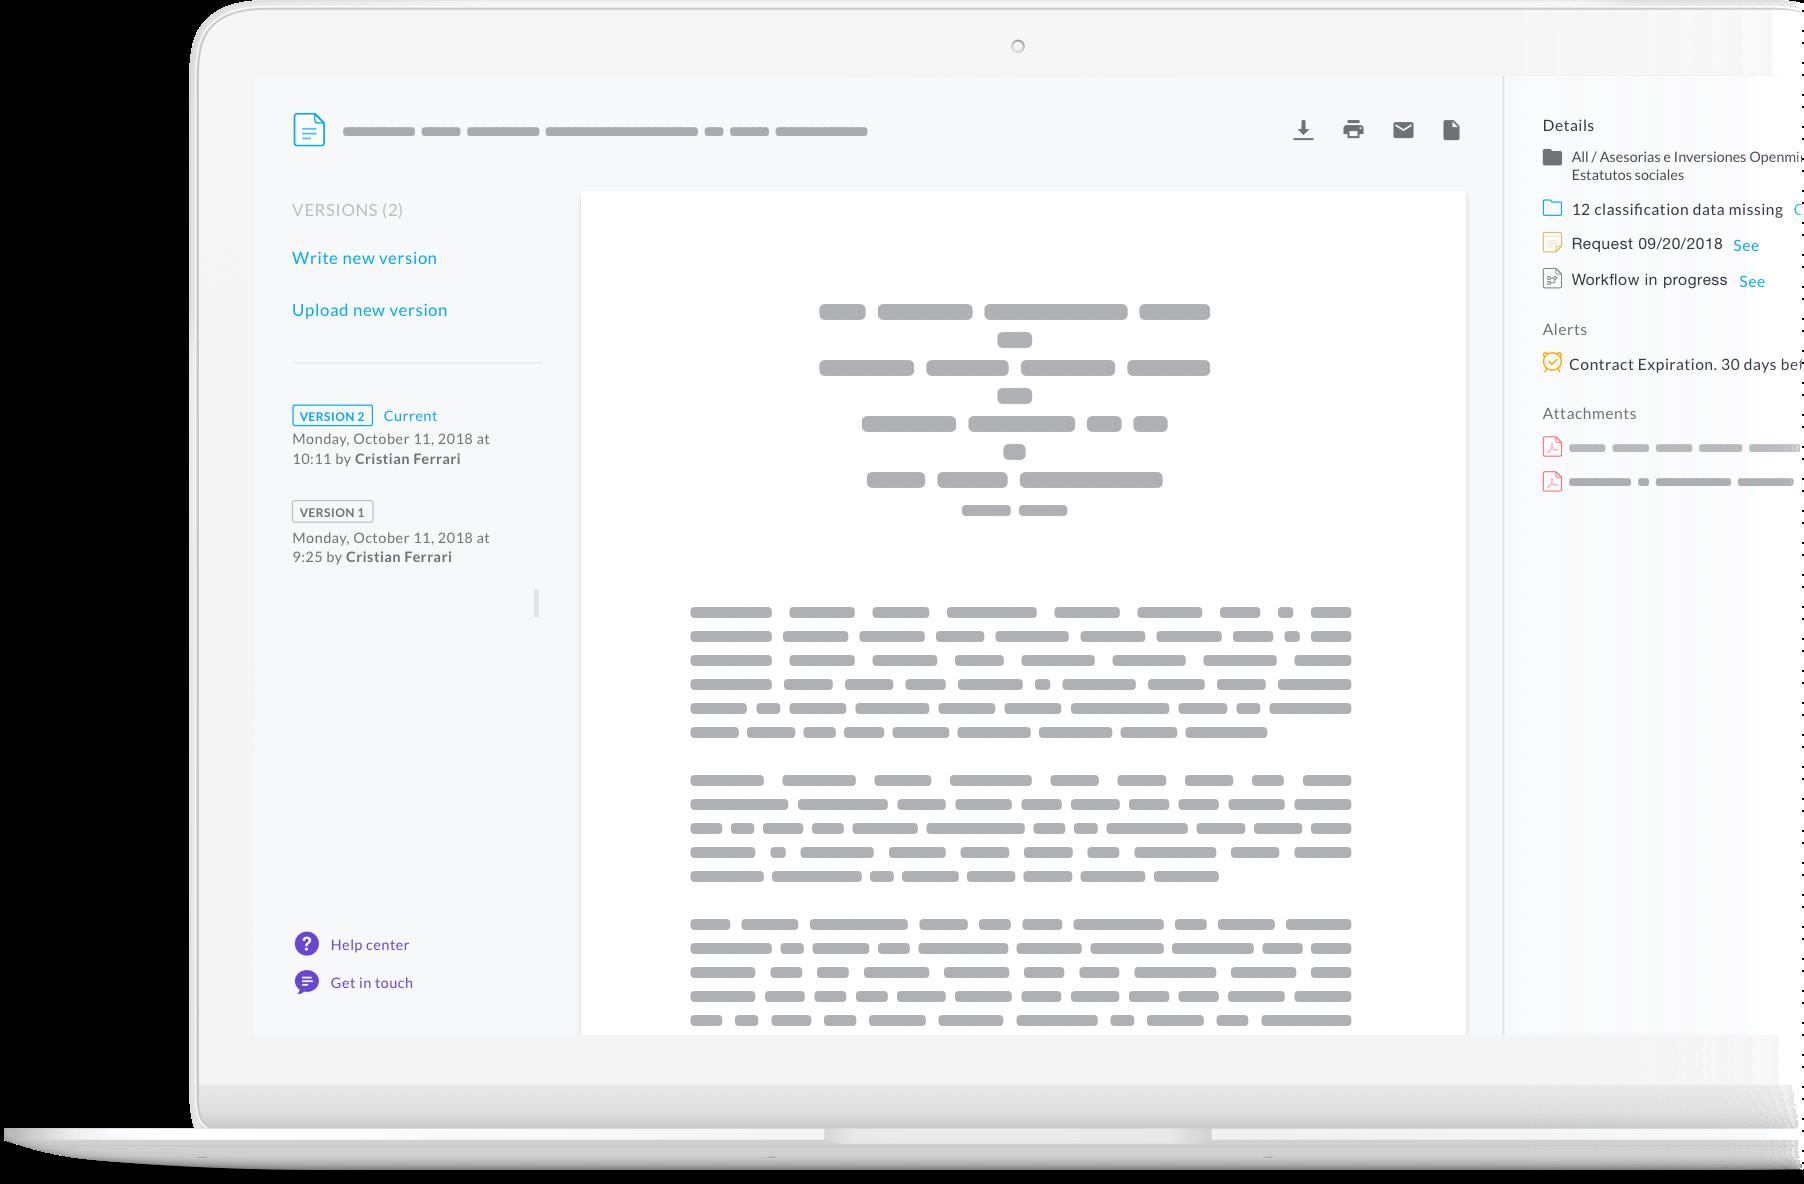 webdox-screen-documento@2x-en